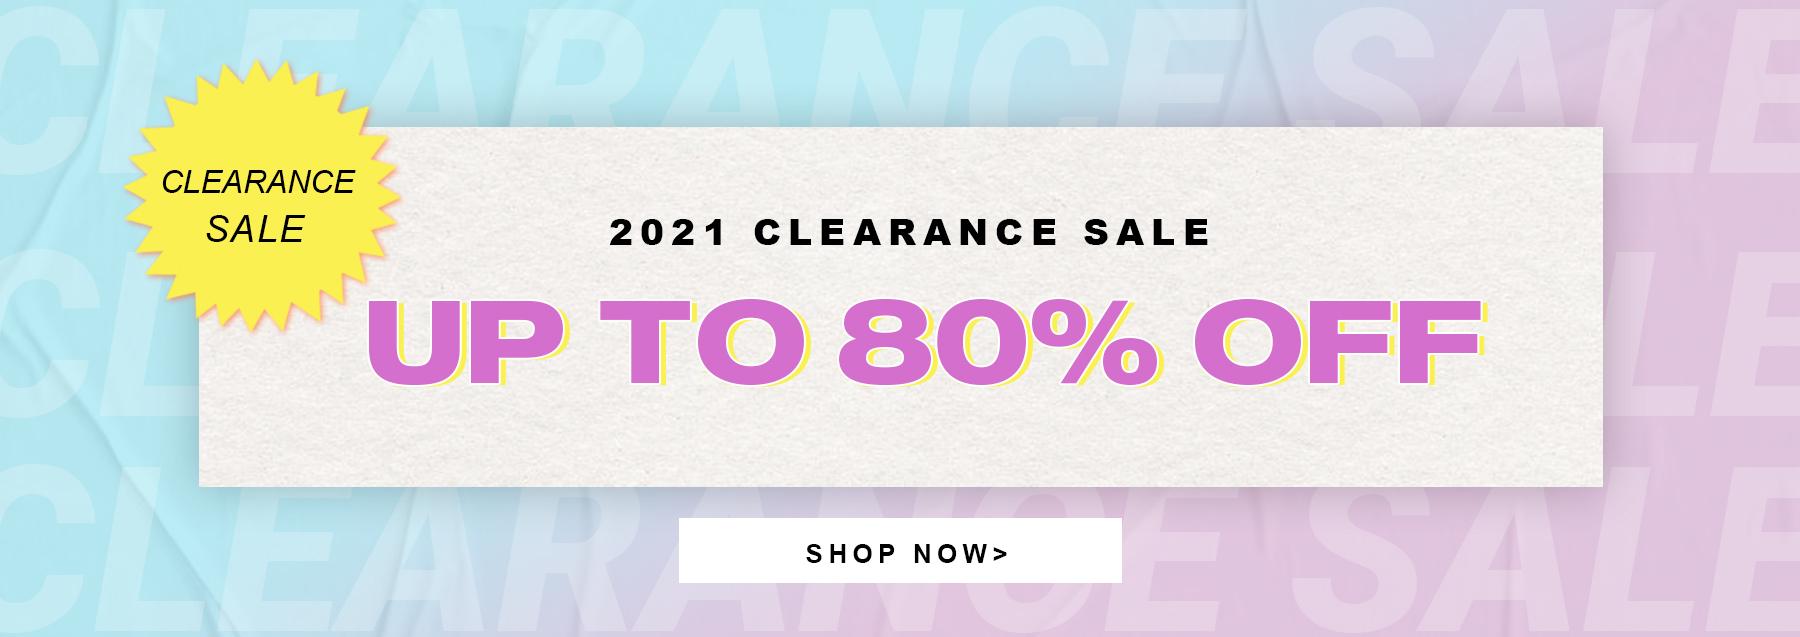 #2021 Clearance Sale